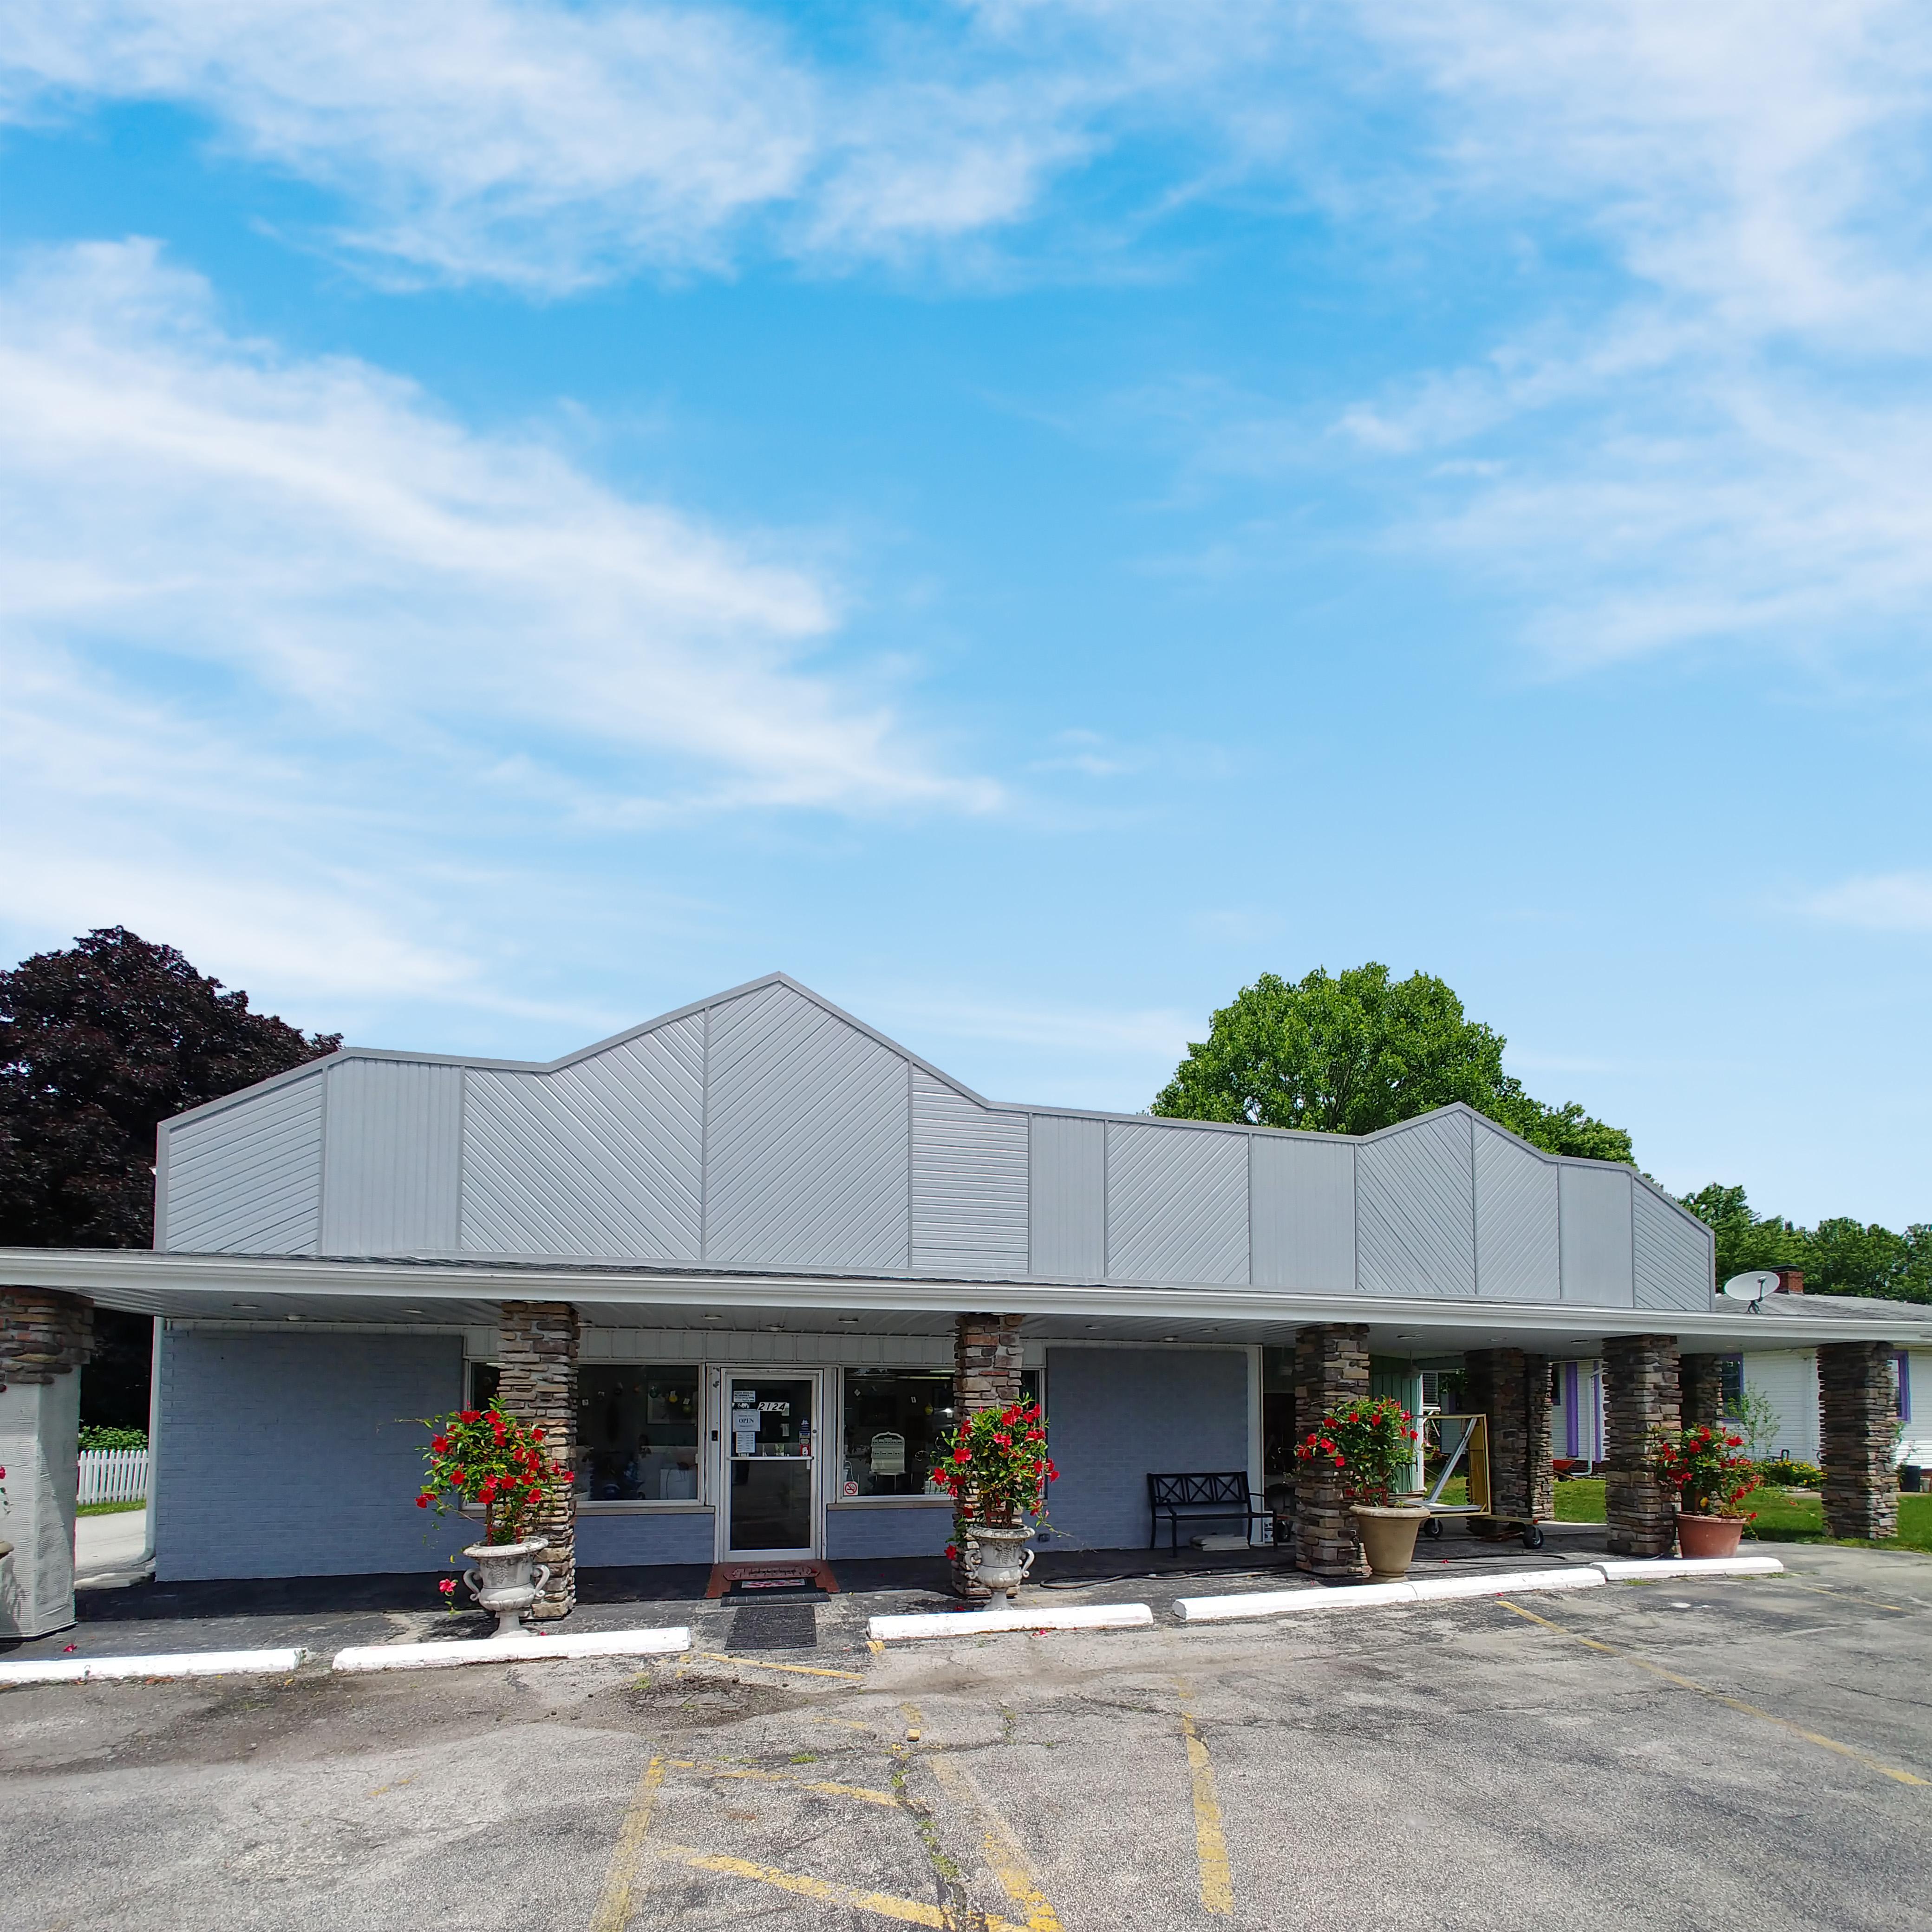 Inspired Fire Glass Art Studio & Gallery located in Lafayette, IN near Purdue University